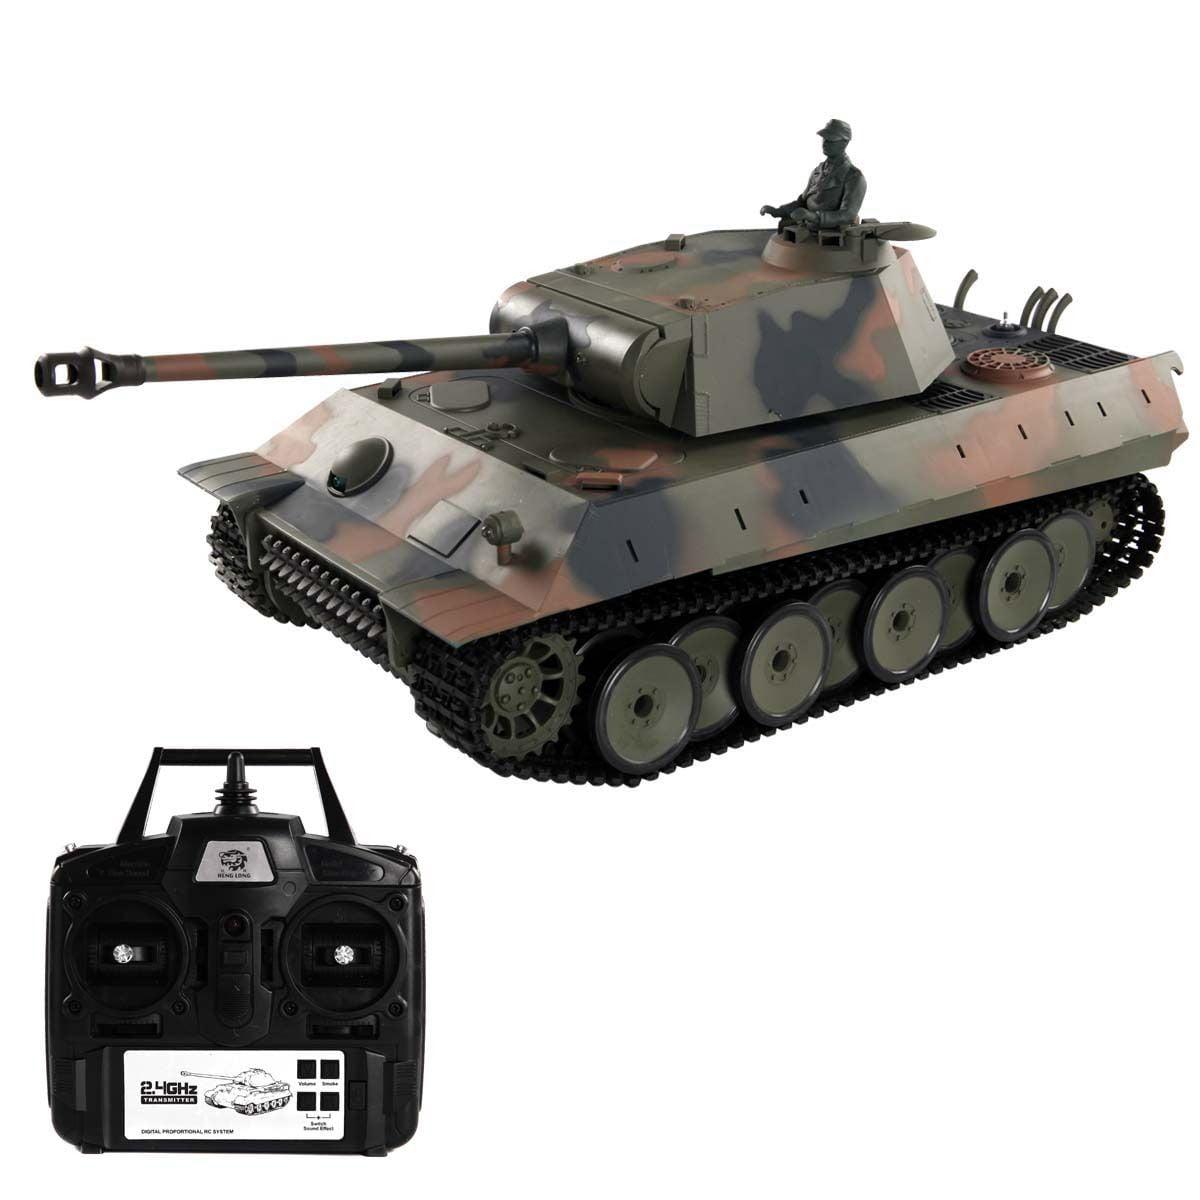 Costway 1:16 2.4G German Panther RC Battle Tank Smoke & Sound Remote Control by Costway